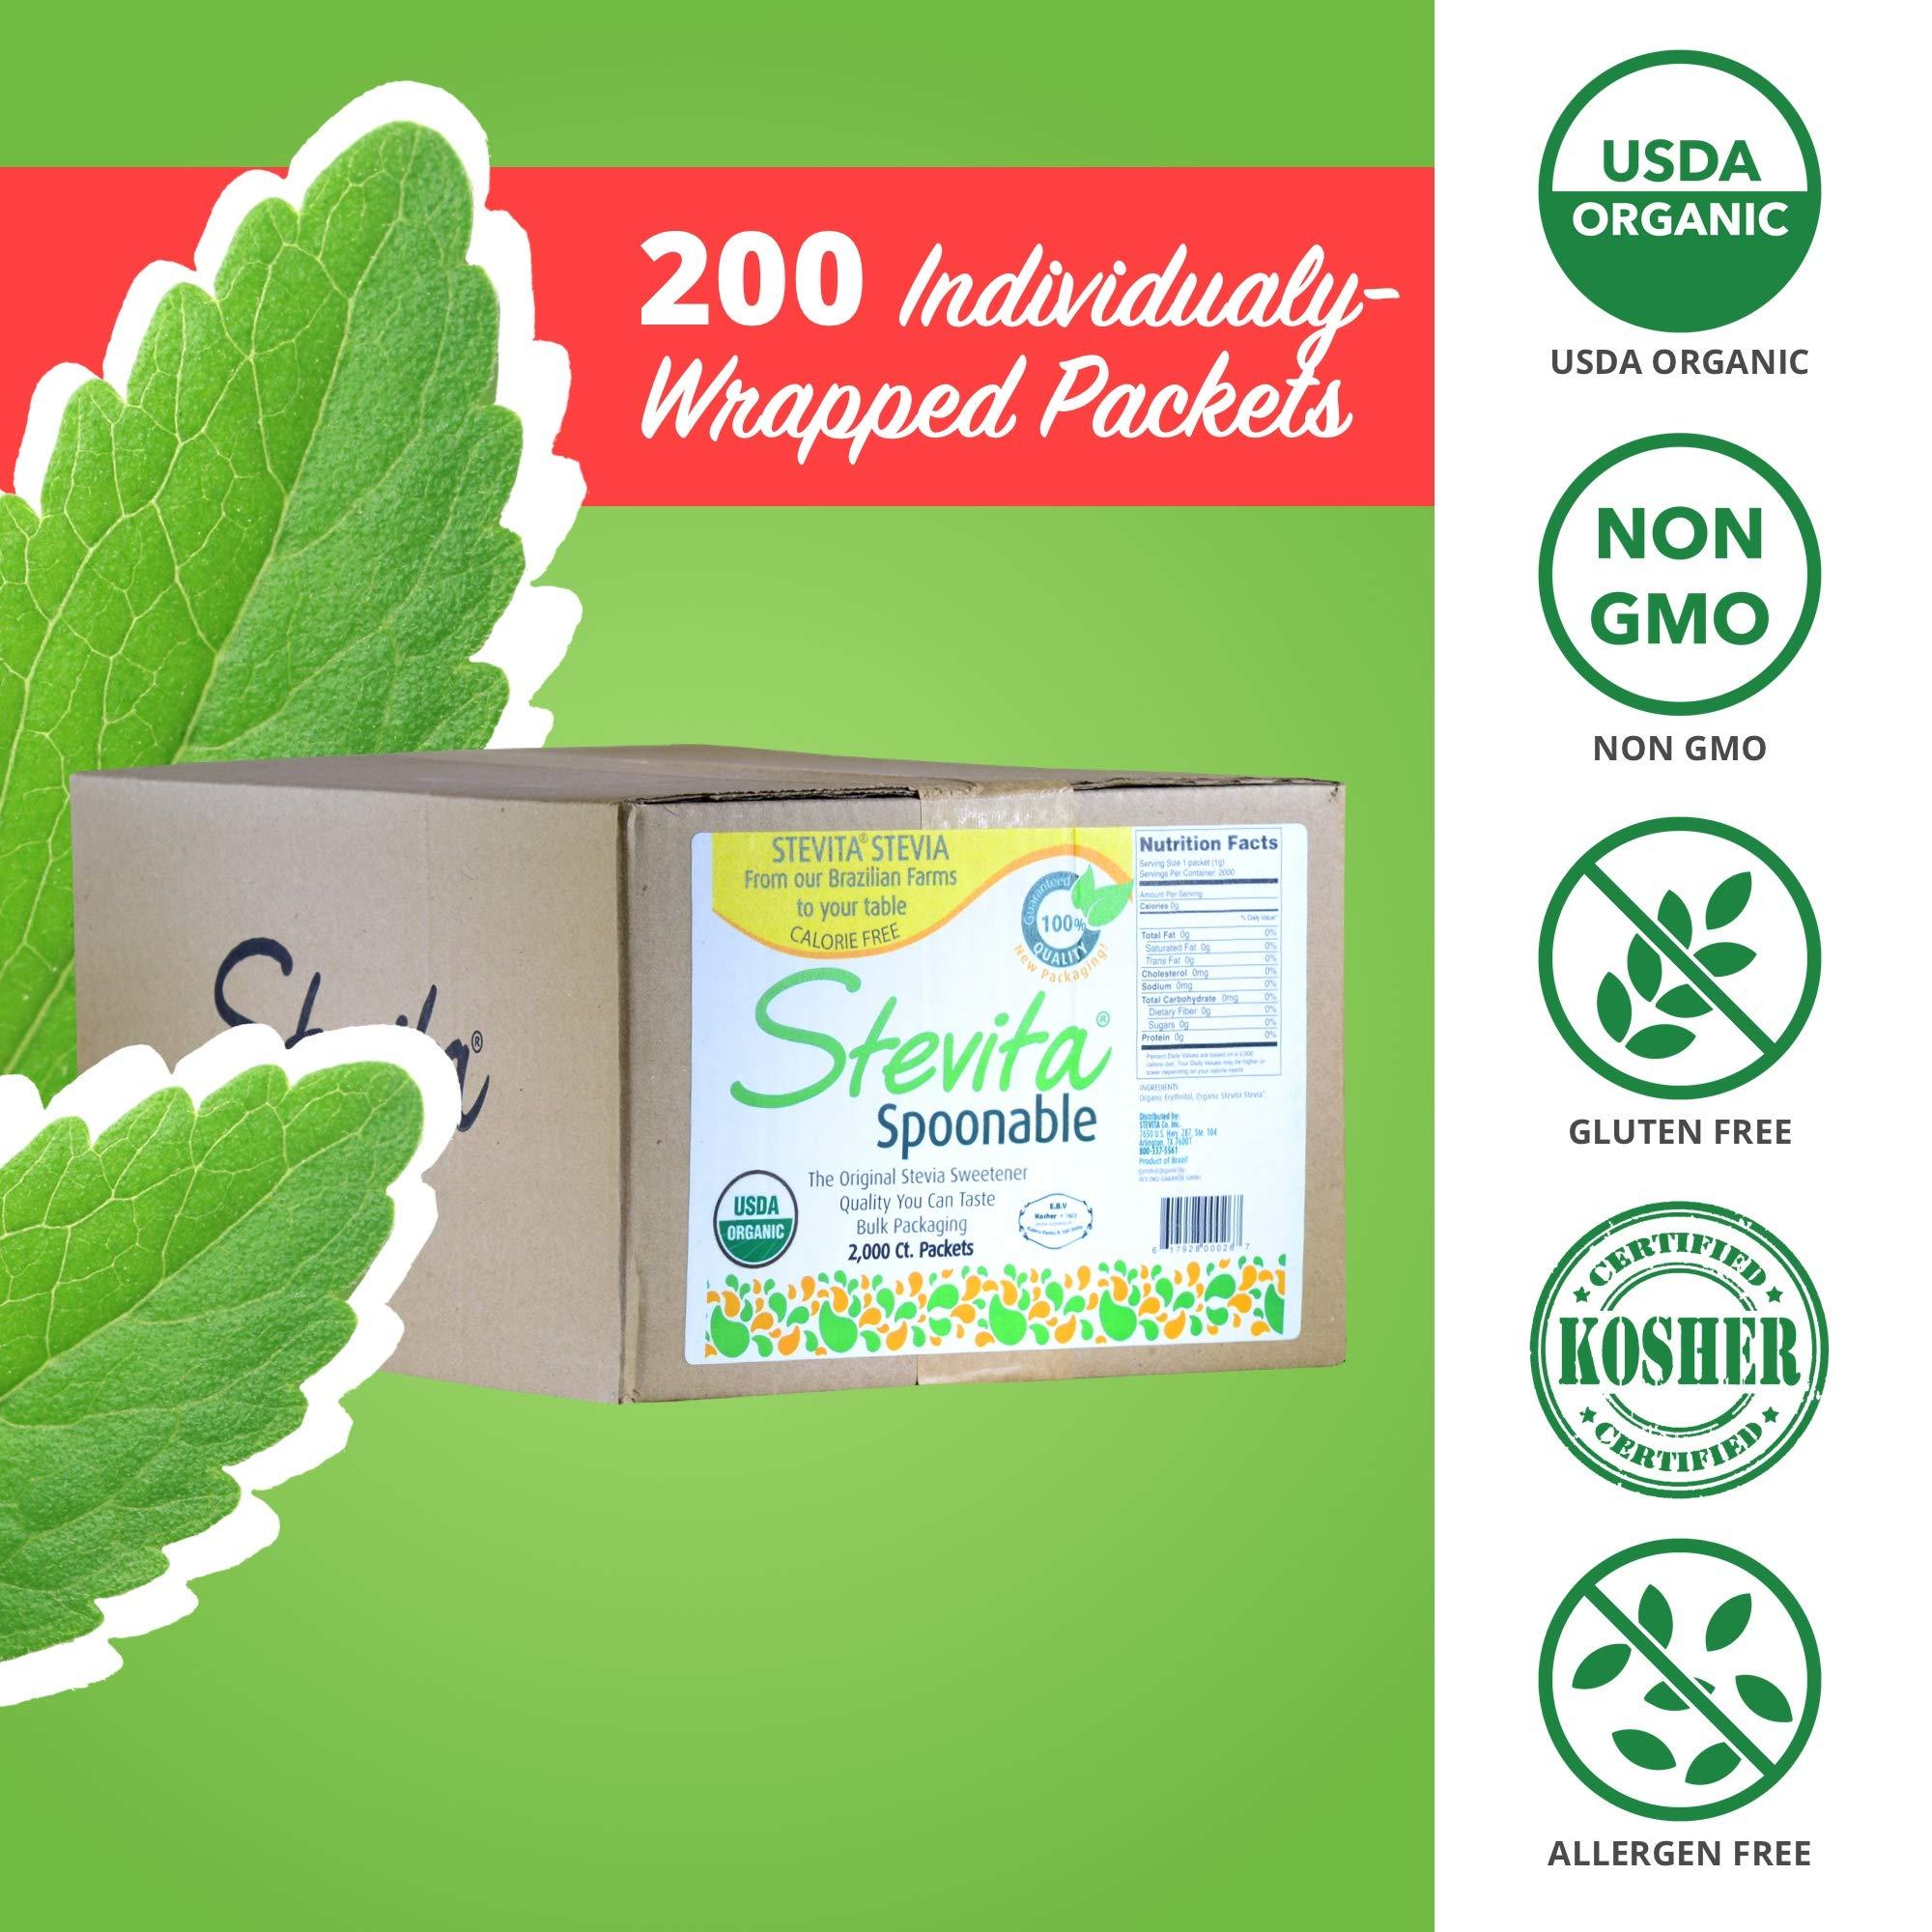 Stevita Organic Spoonable Stevia Packets - 2000 count - Stevia & Erythritol All Natural Sweetener, No Calories - USDA Organic, Non GMO, Vegan, Kosher, Paleo, Gluten-Free - 2000 Servings by STEVITA (Image #6)